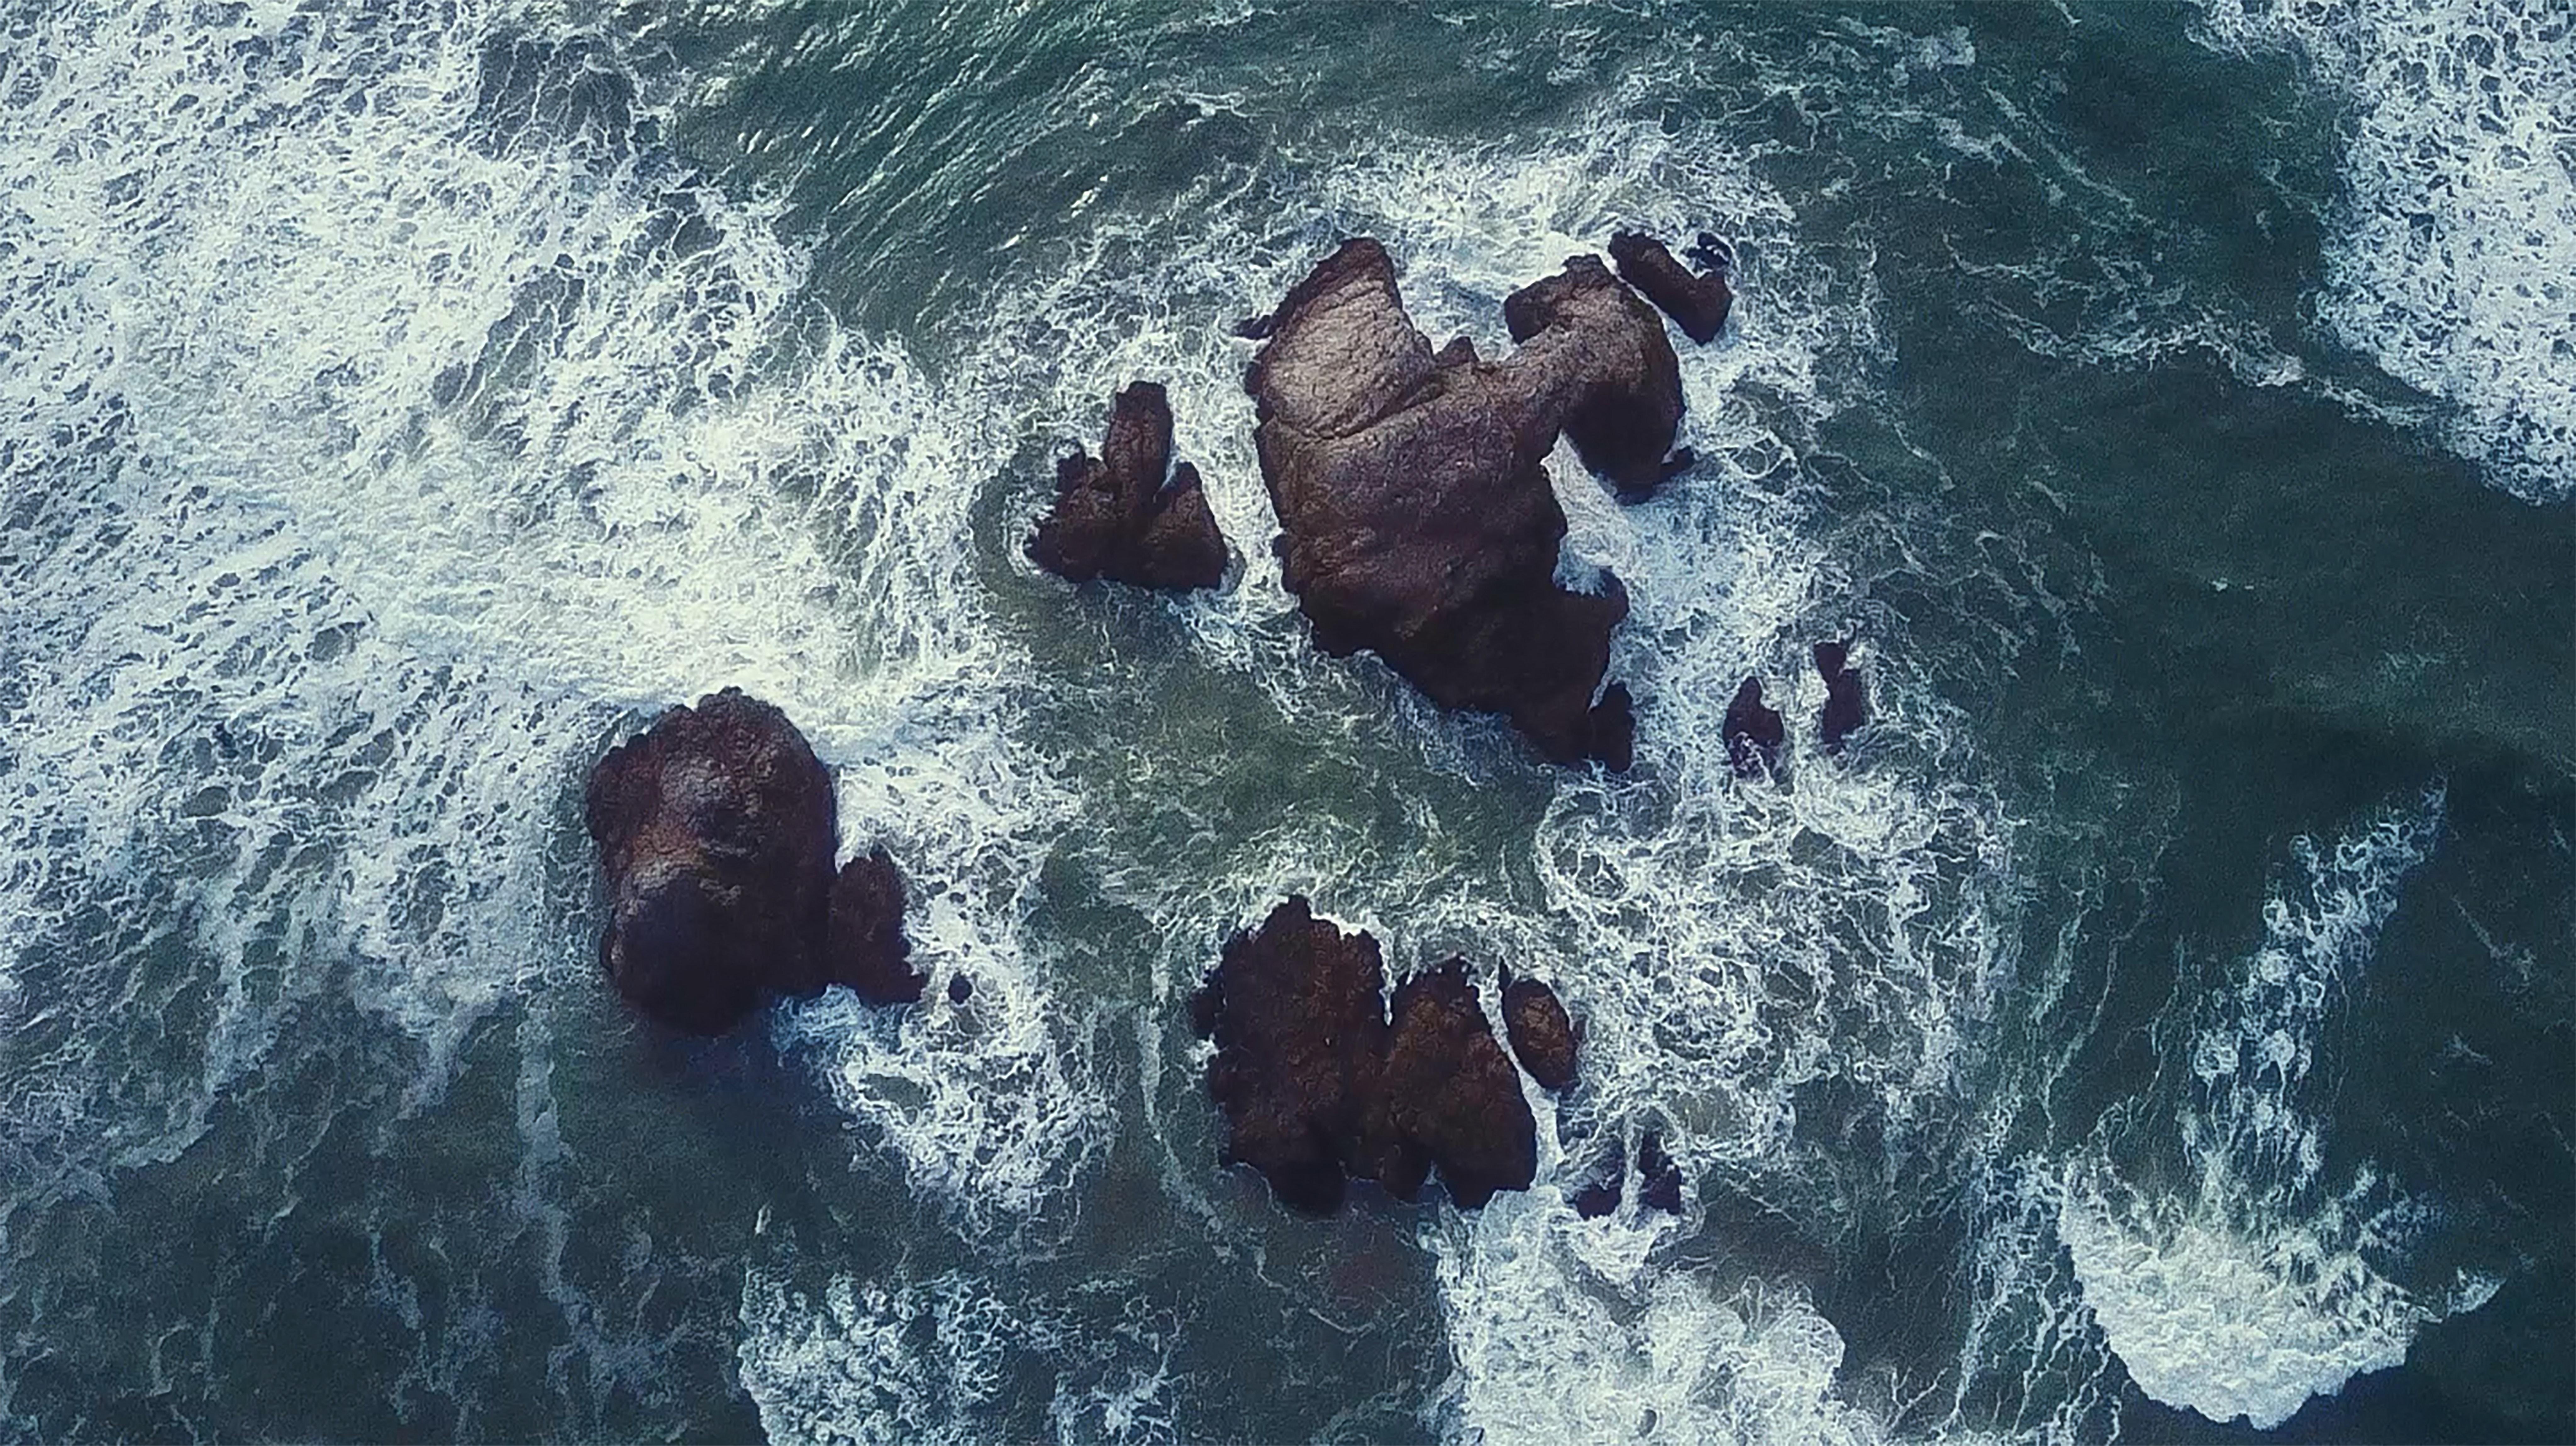 Splashing Wave On Rock Free Stock Photo